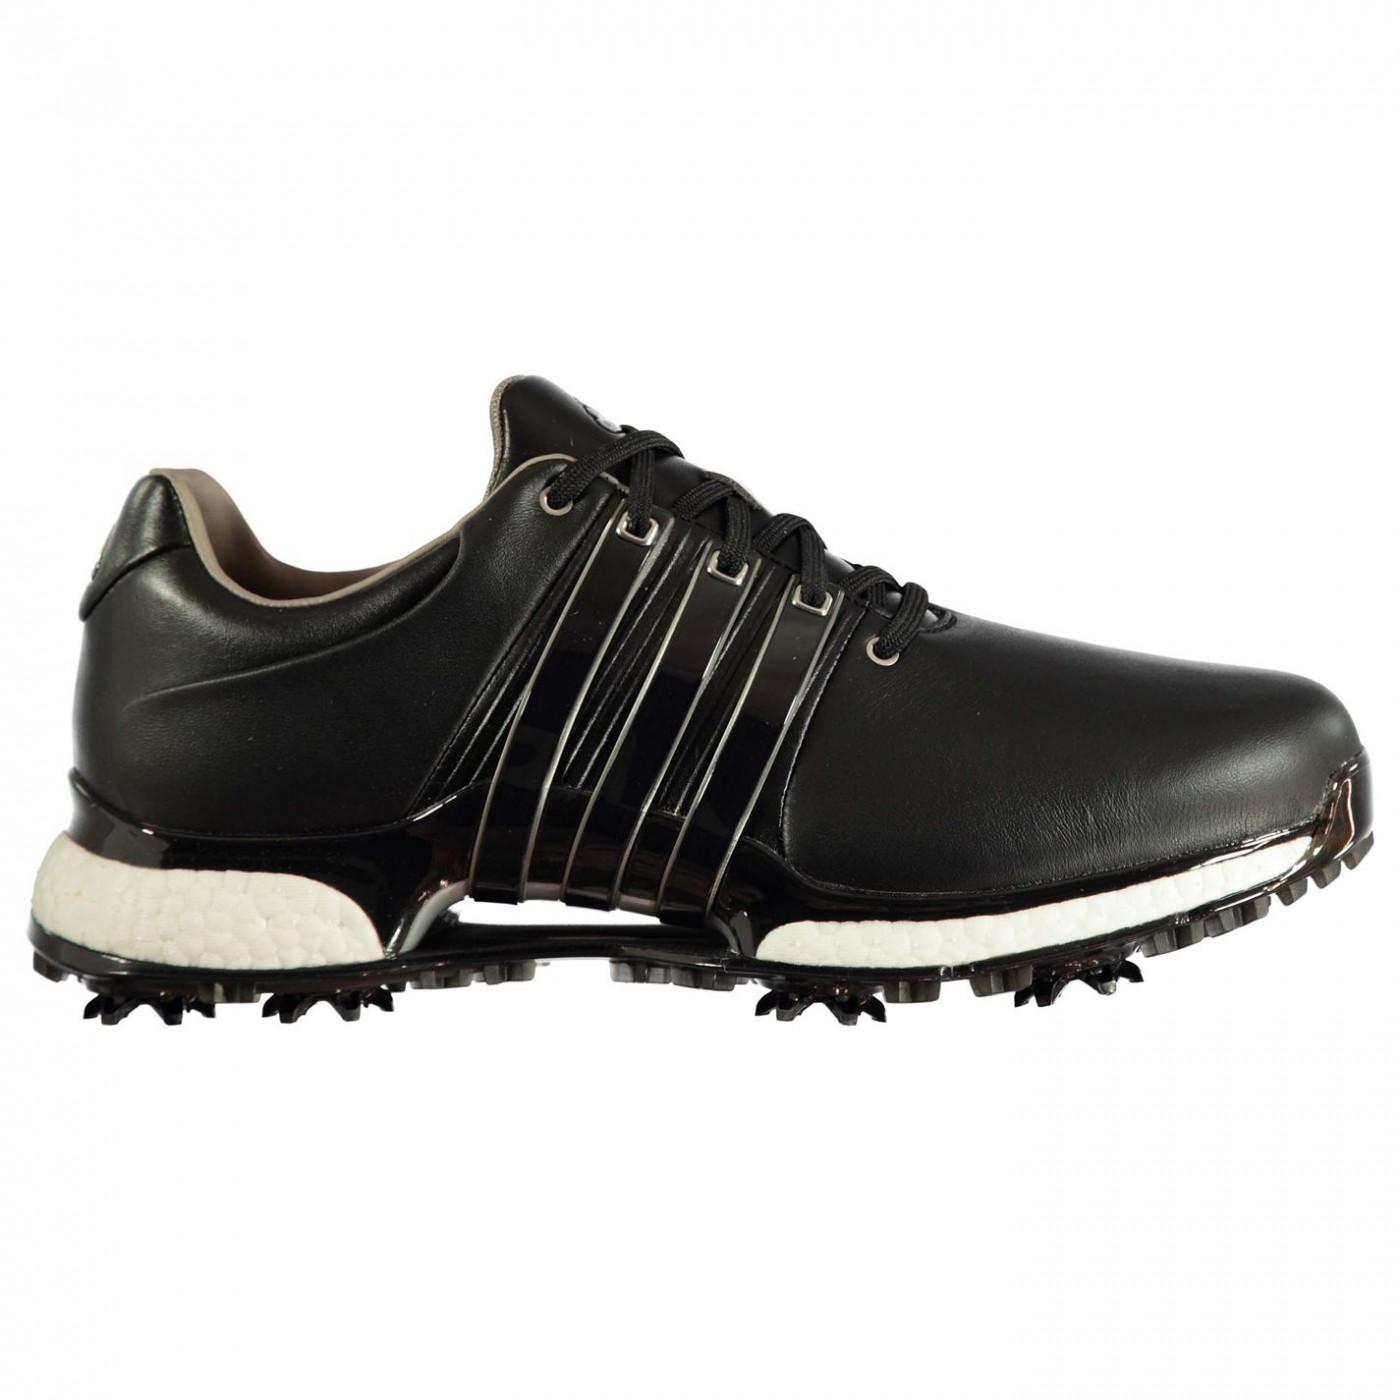 Adidas Tour 360 XT Mens Golf Trainers